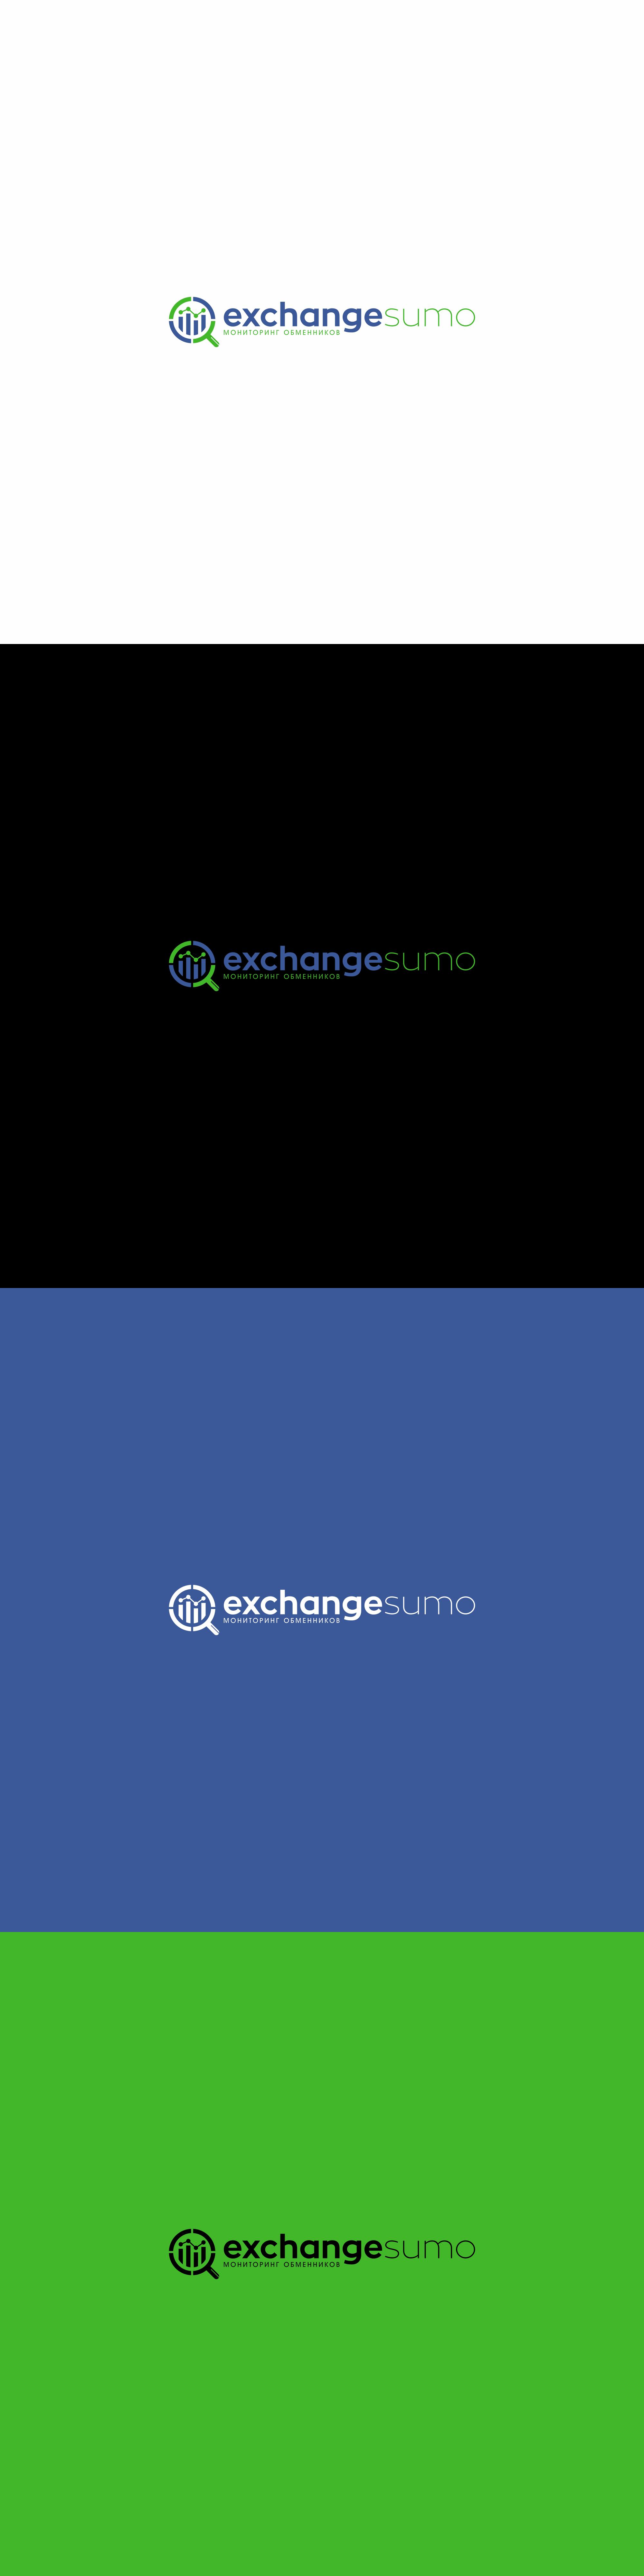 Логотип для мониторинга обменников фото f_2615bade5a4c0f26.jpg